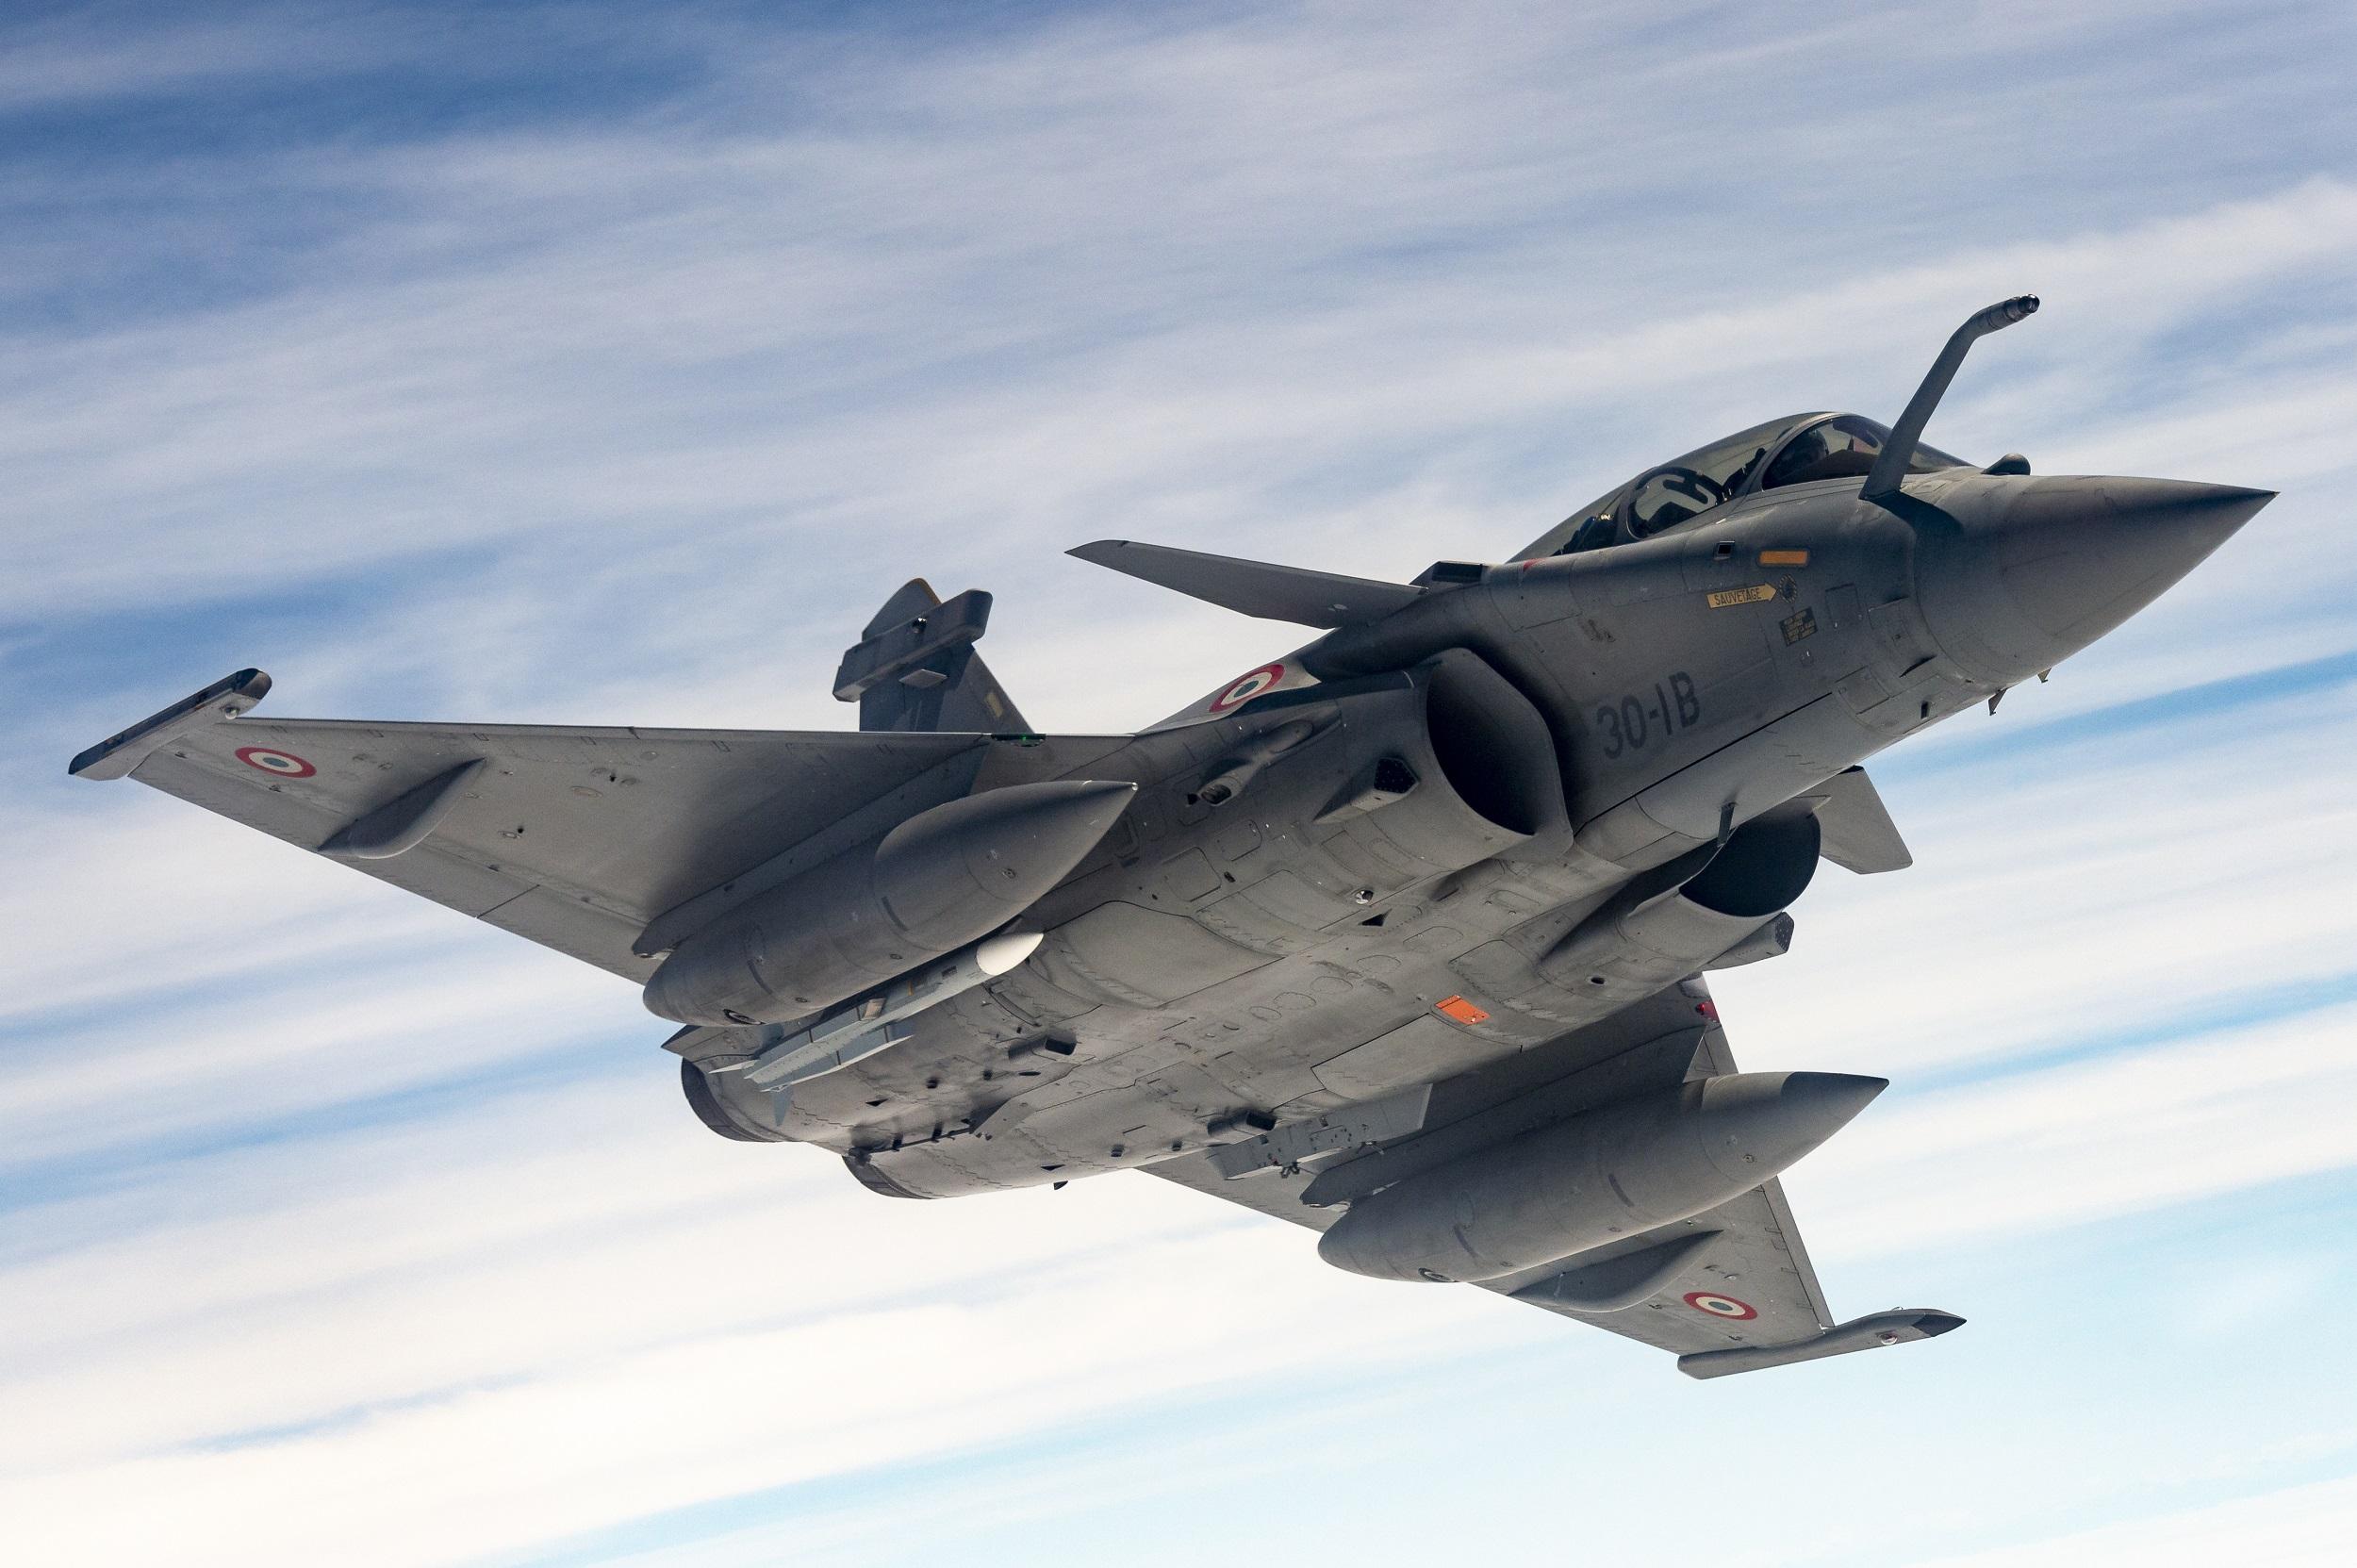 Rafale – Meteor: Ο πύραυλος της ΠΑ που θα «τρομοκρατεί» την Τουρκία